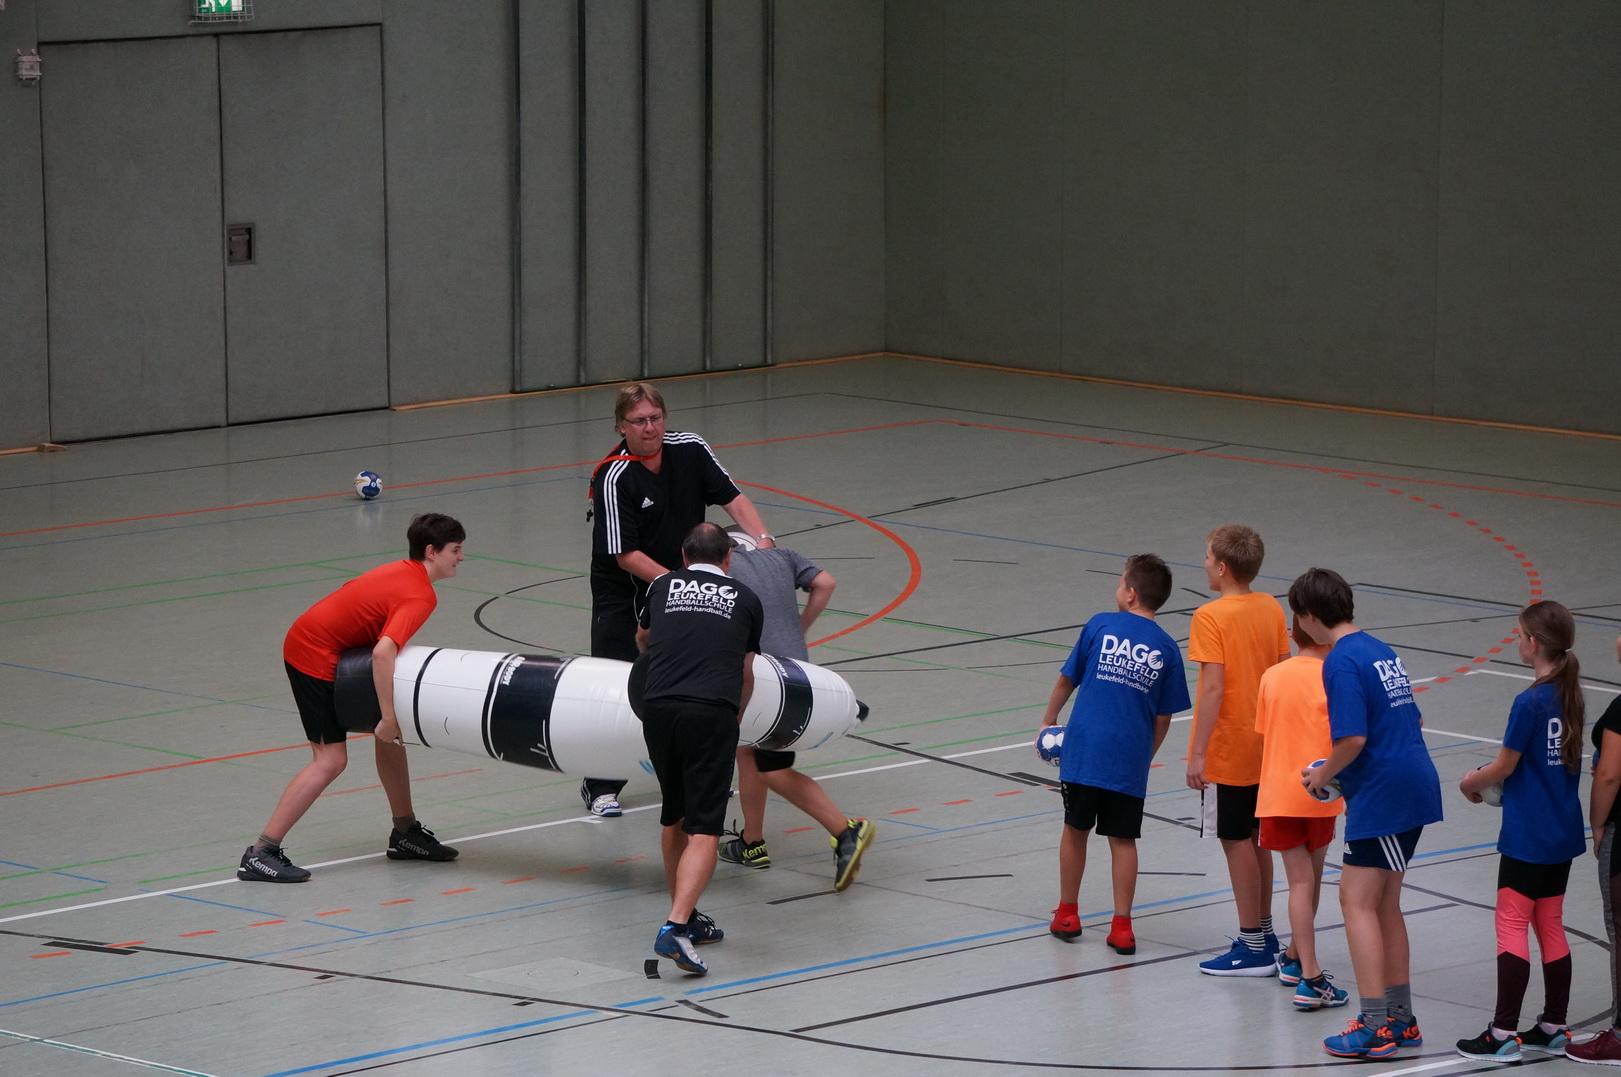 201808_Handballcamp_SDH_MG_258w